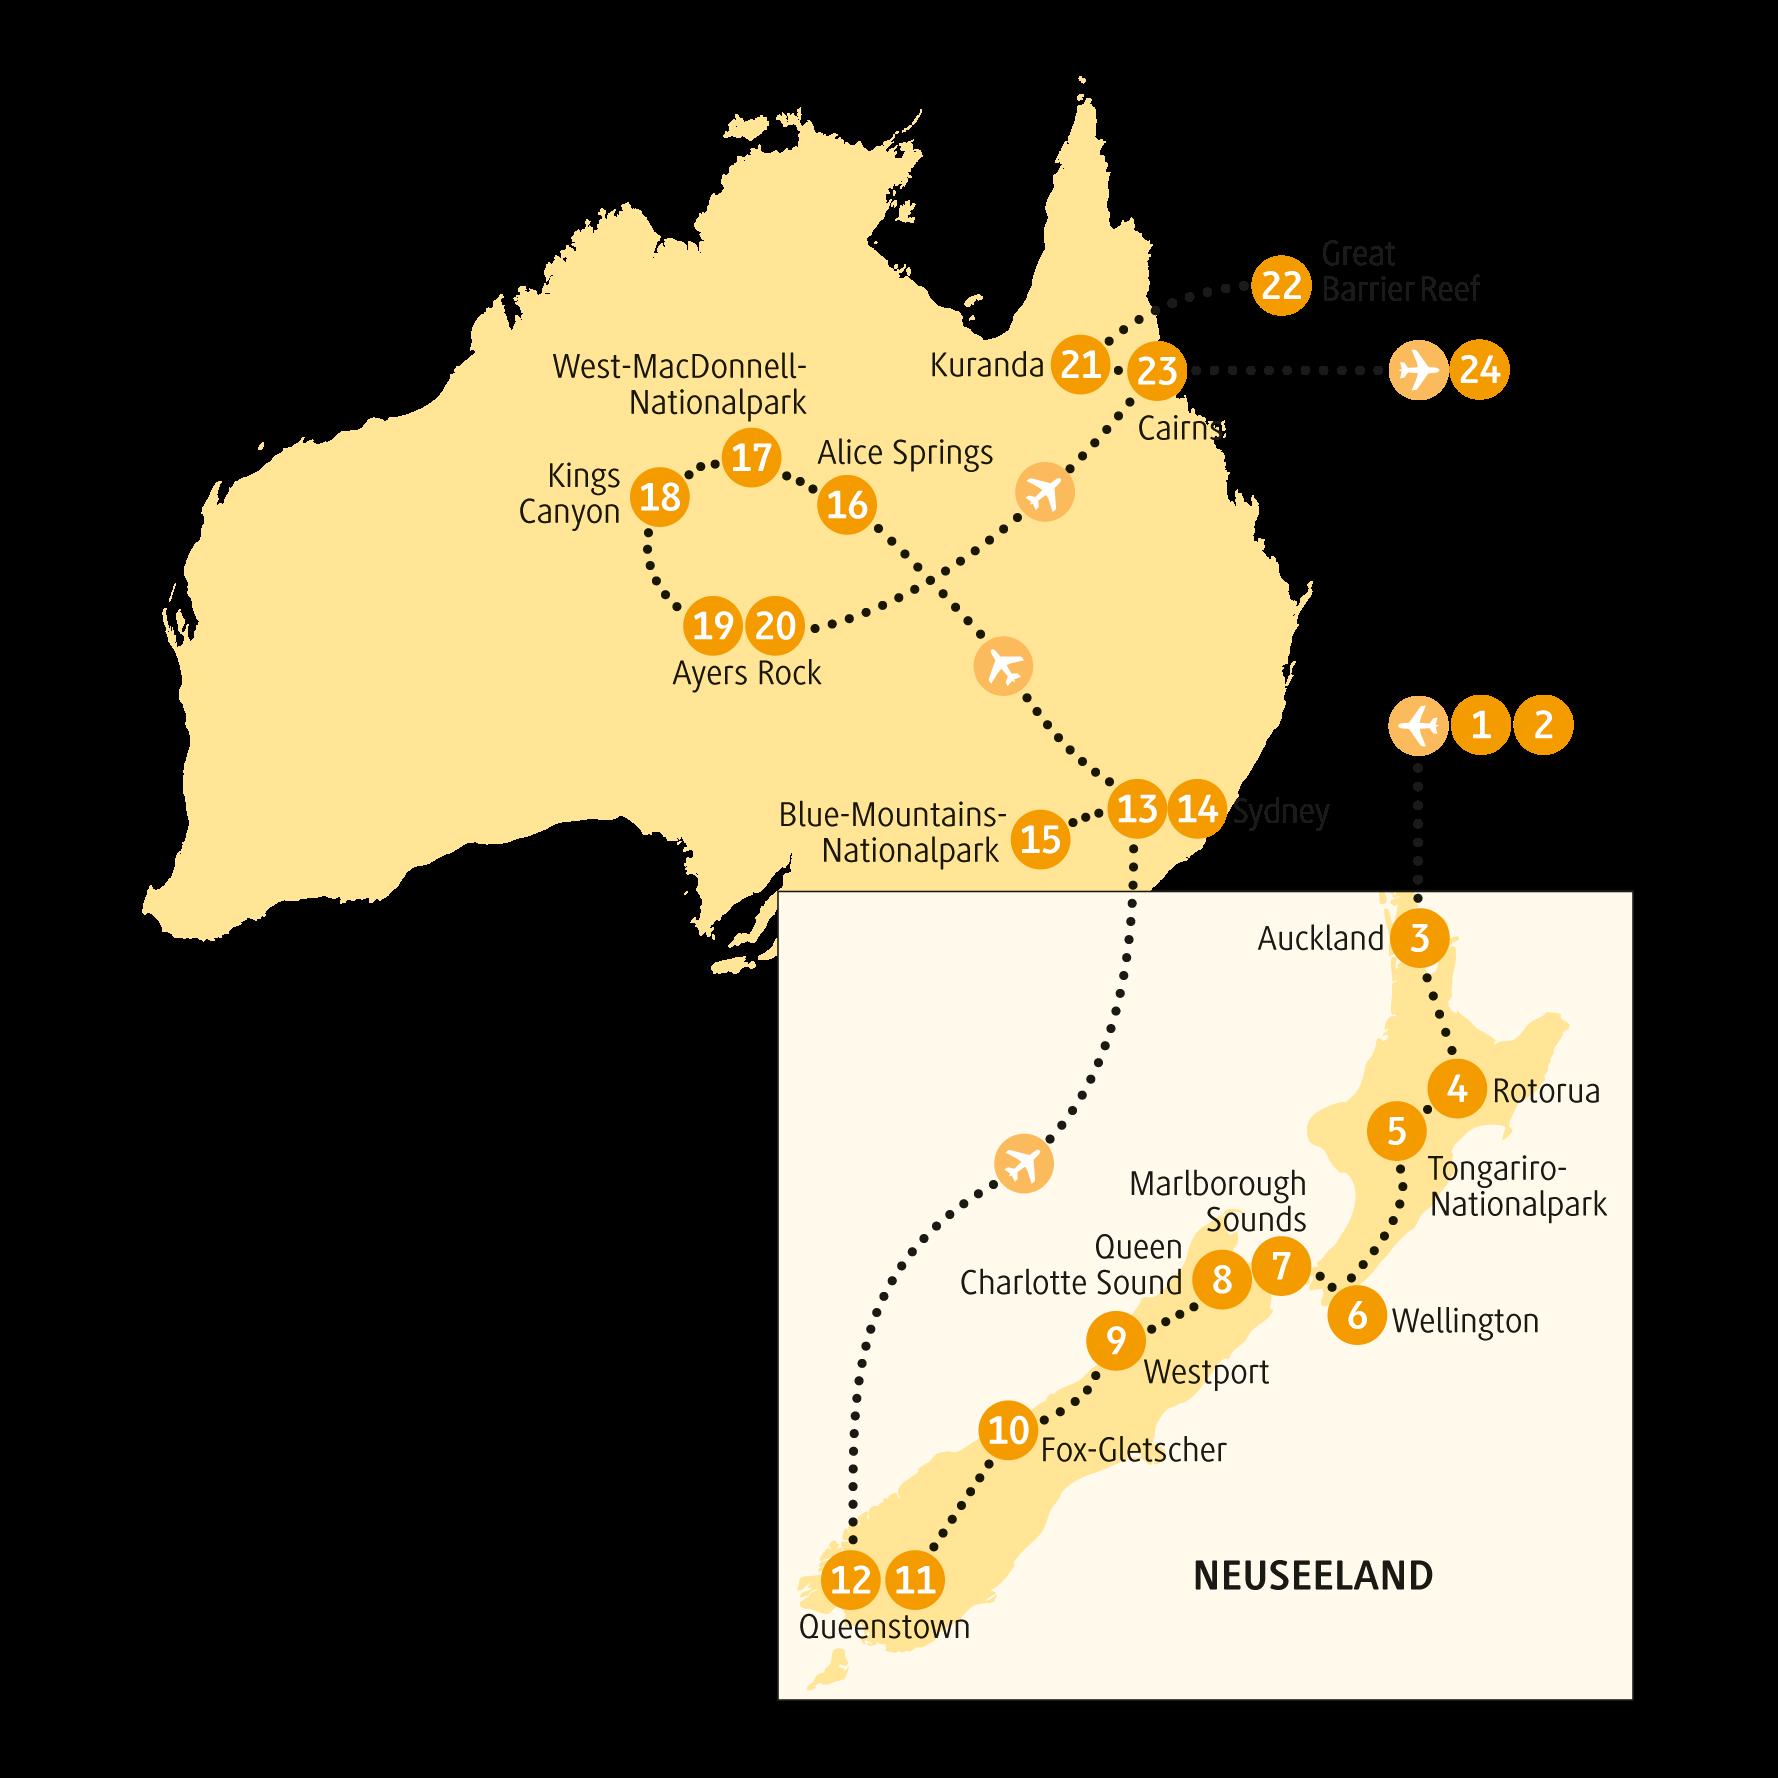 K303274ste Algarve Karte.Karte Neuseeland Sudinsel Zum Ausdrucken